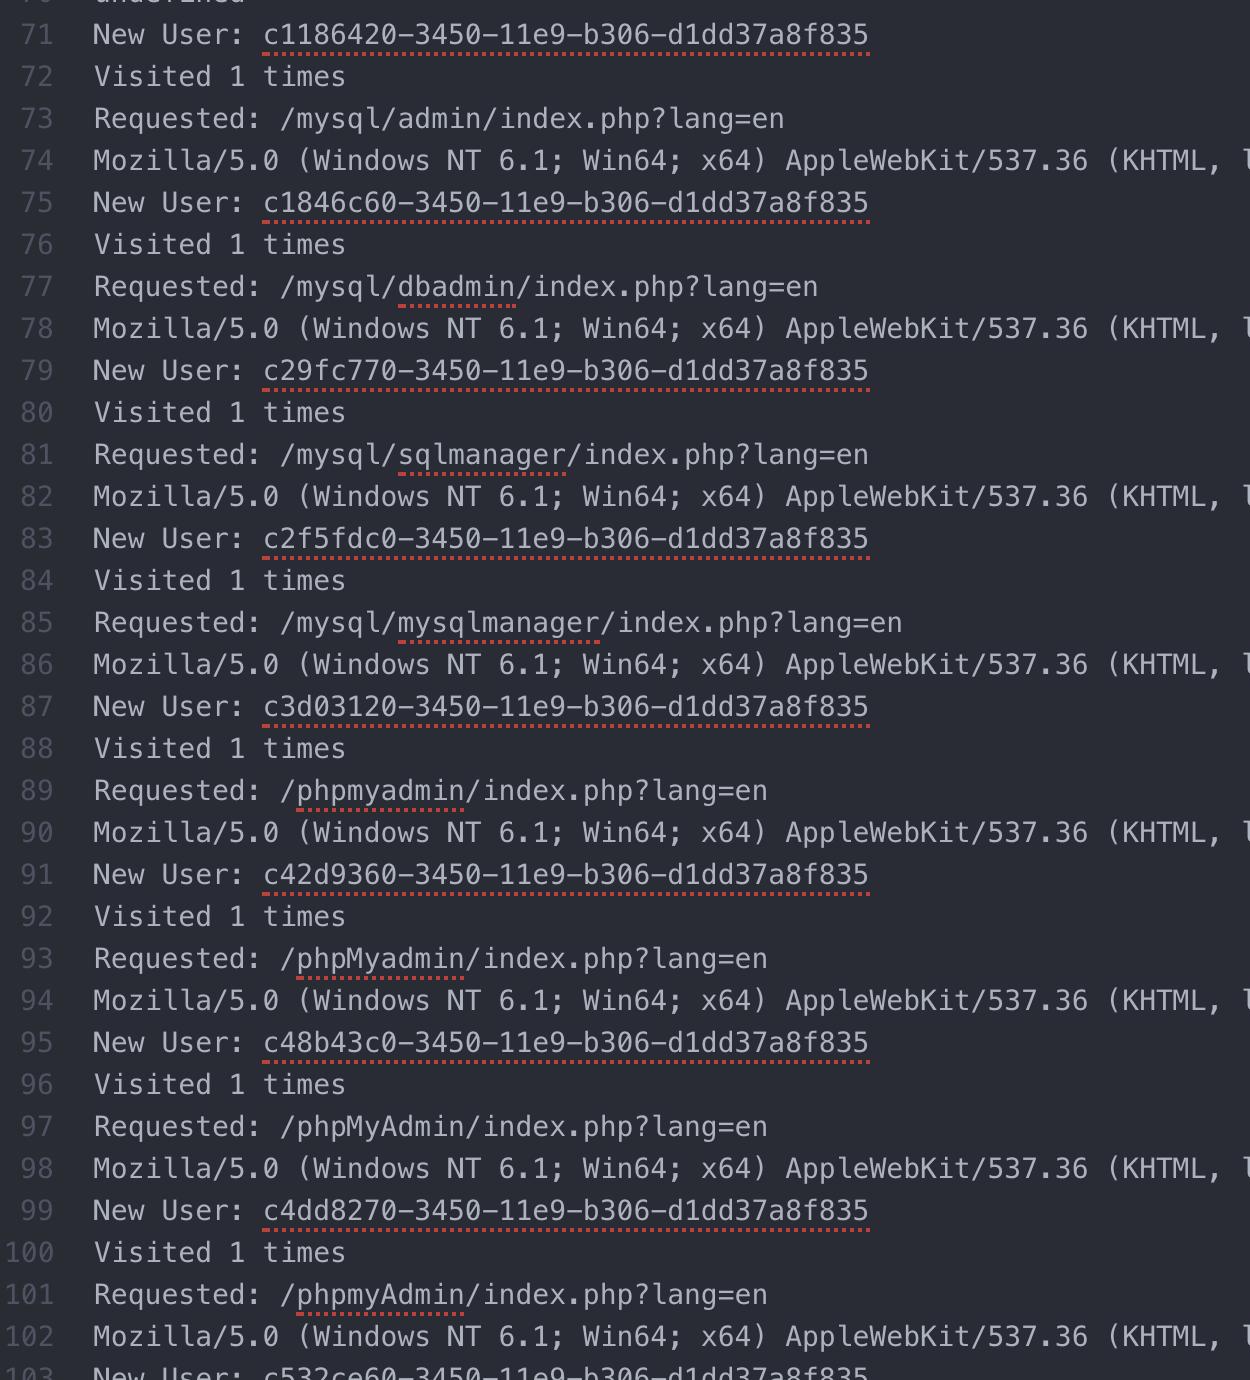 Screenshot 2019-02-19 23.27.18.png